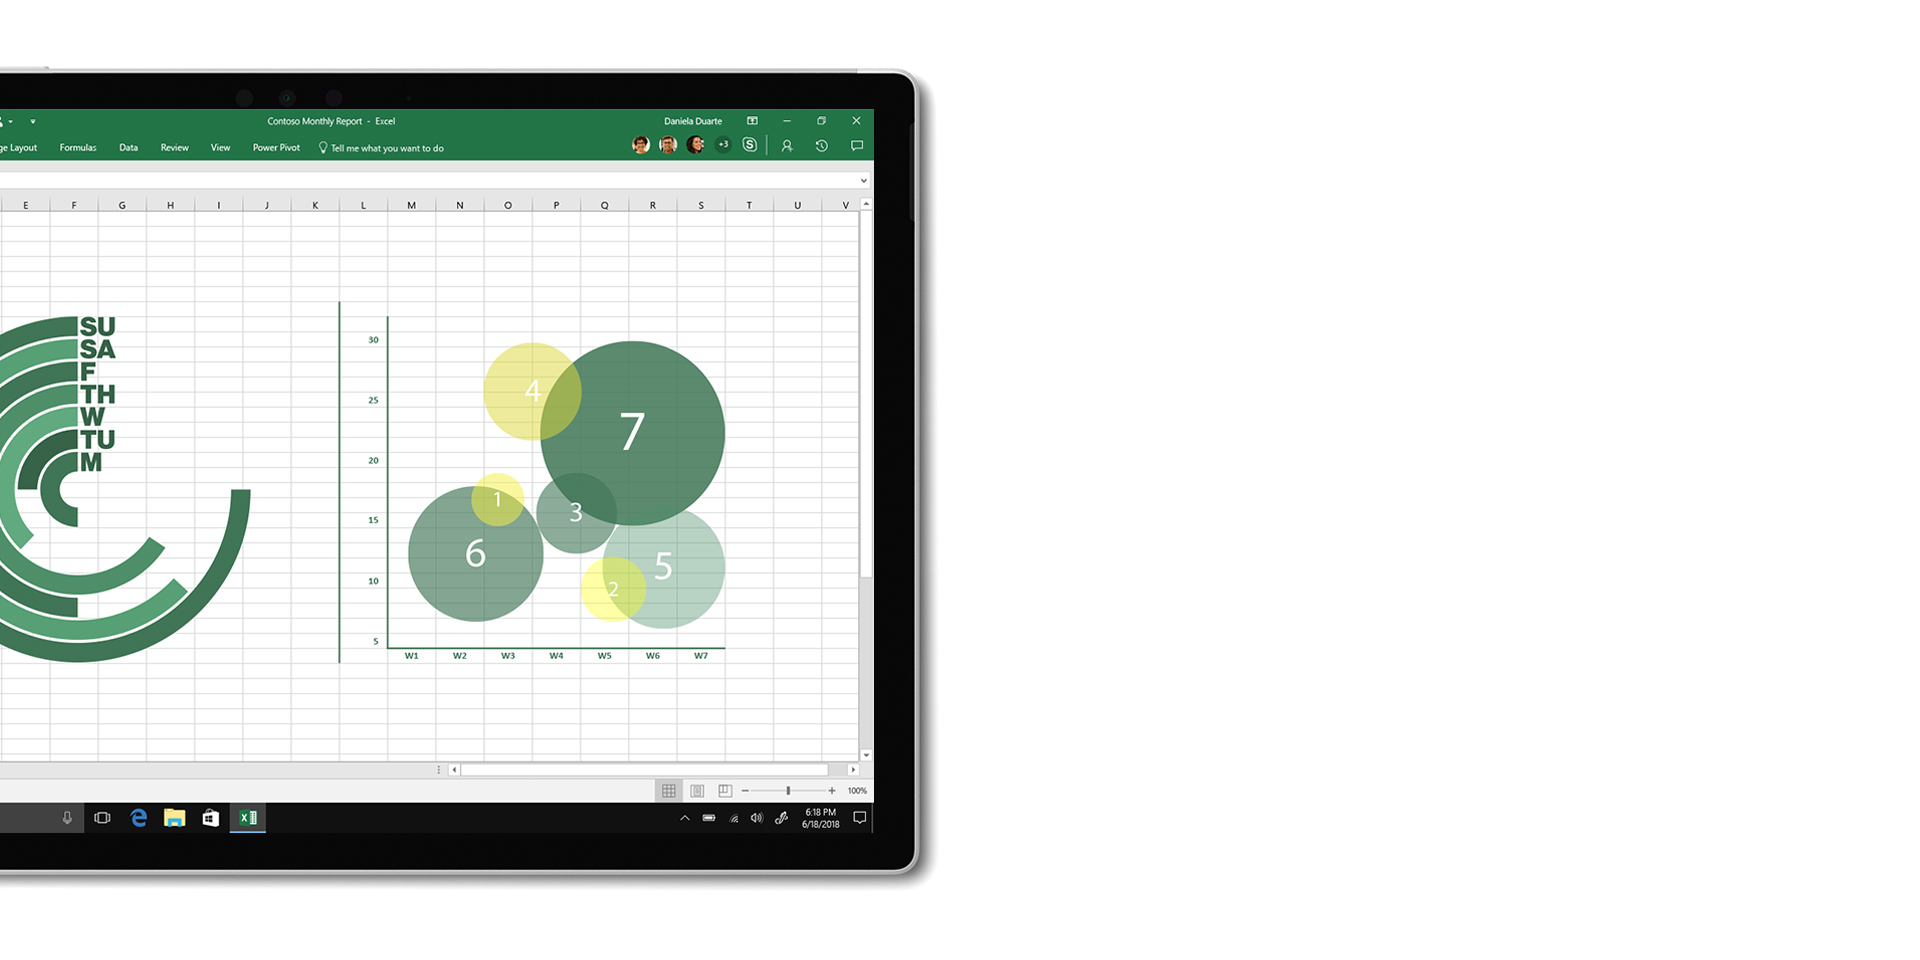 Excel 應用程式顯示在已從鍵盤拆下的 Surface Book 2 螢幕上。